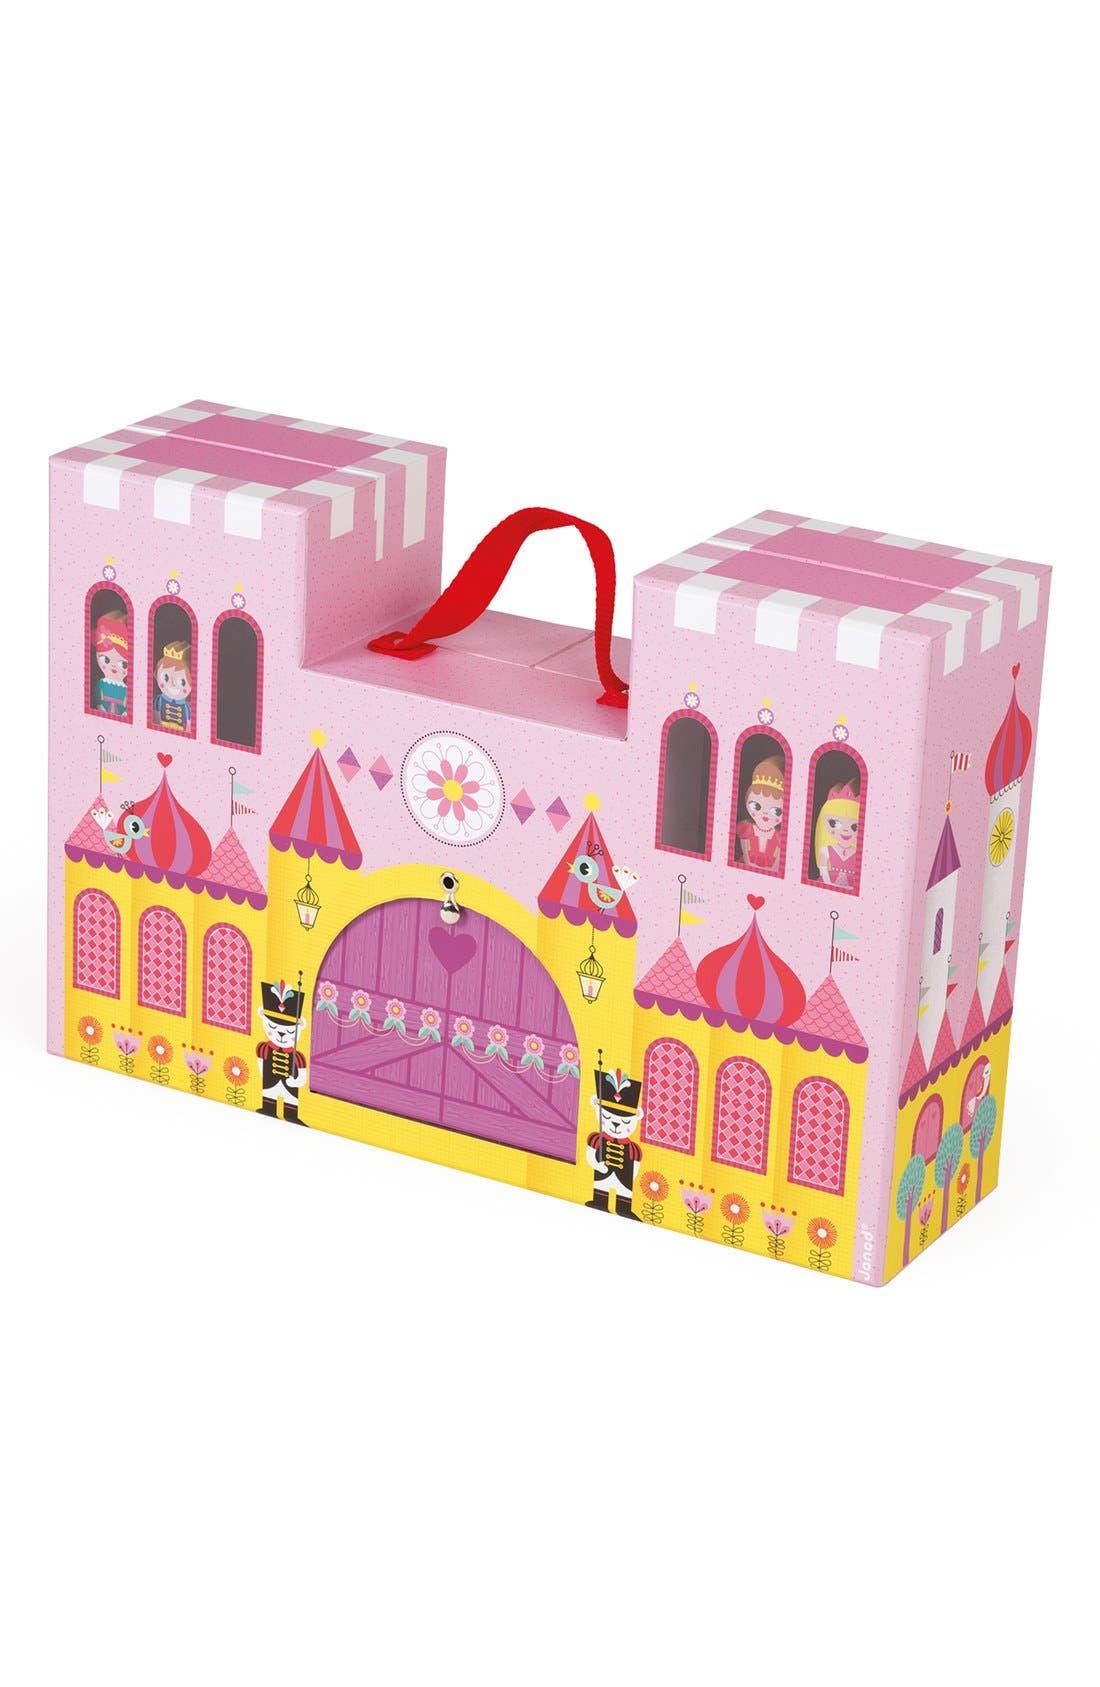 JANOD 'Princess Palace' Play Set